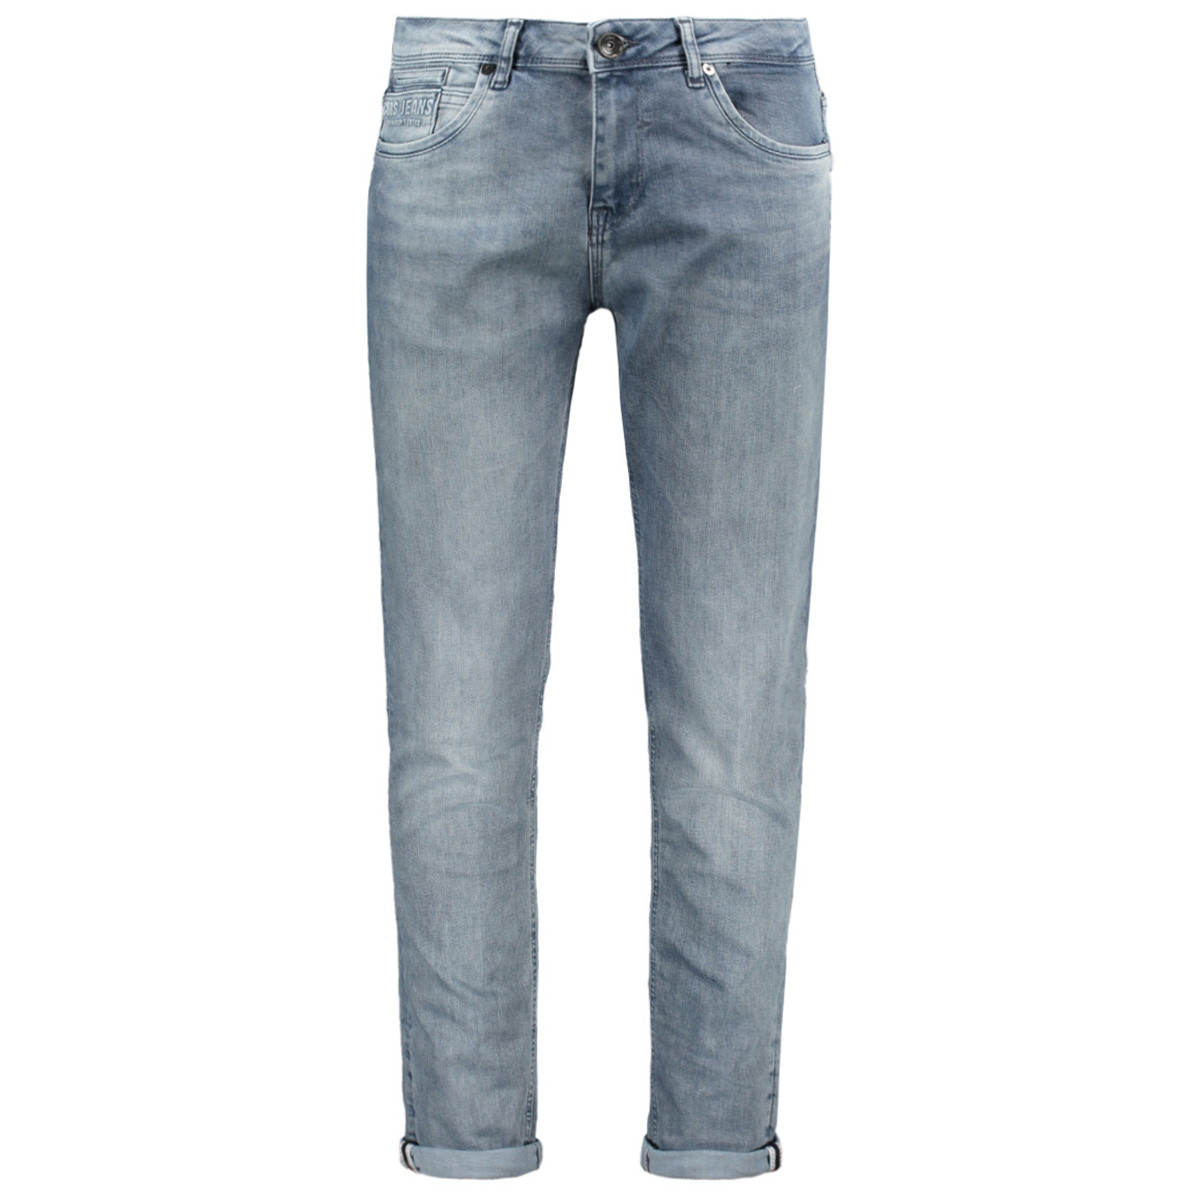 blast london magnette 78462 cars jeans 71 grey blue